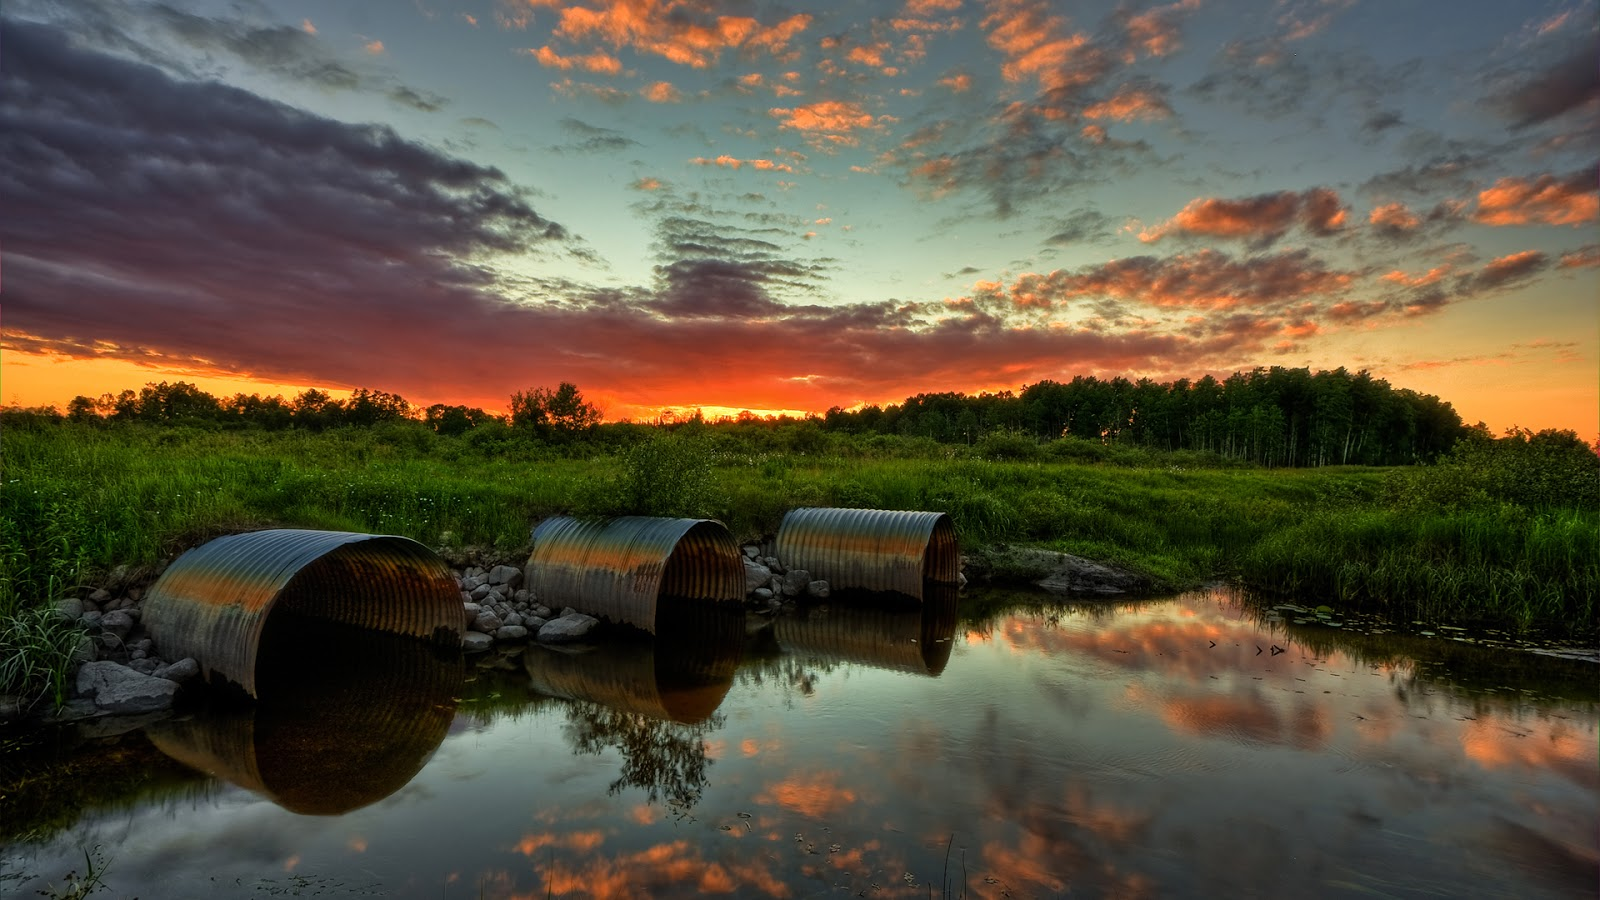 75 paisagens deslumbrantes wallpapers Full HD 1920 x 1080   Imagens para photoshop